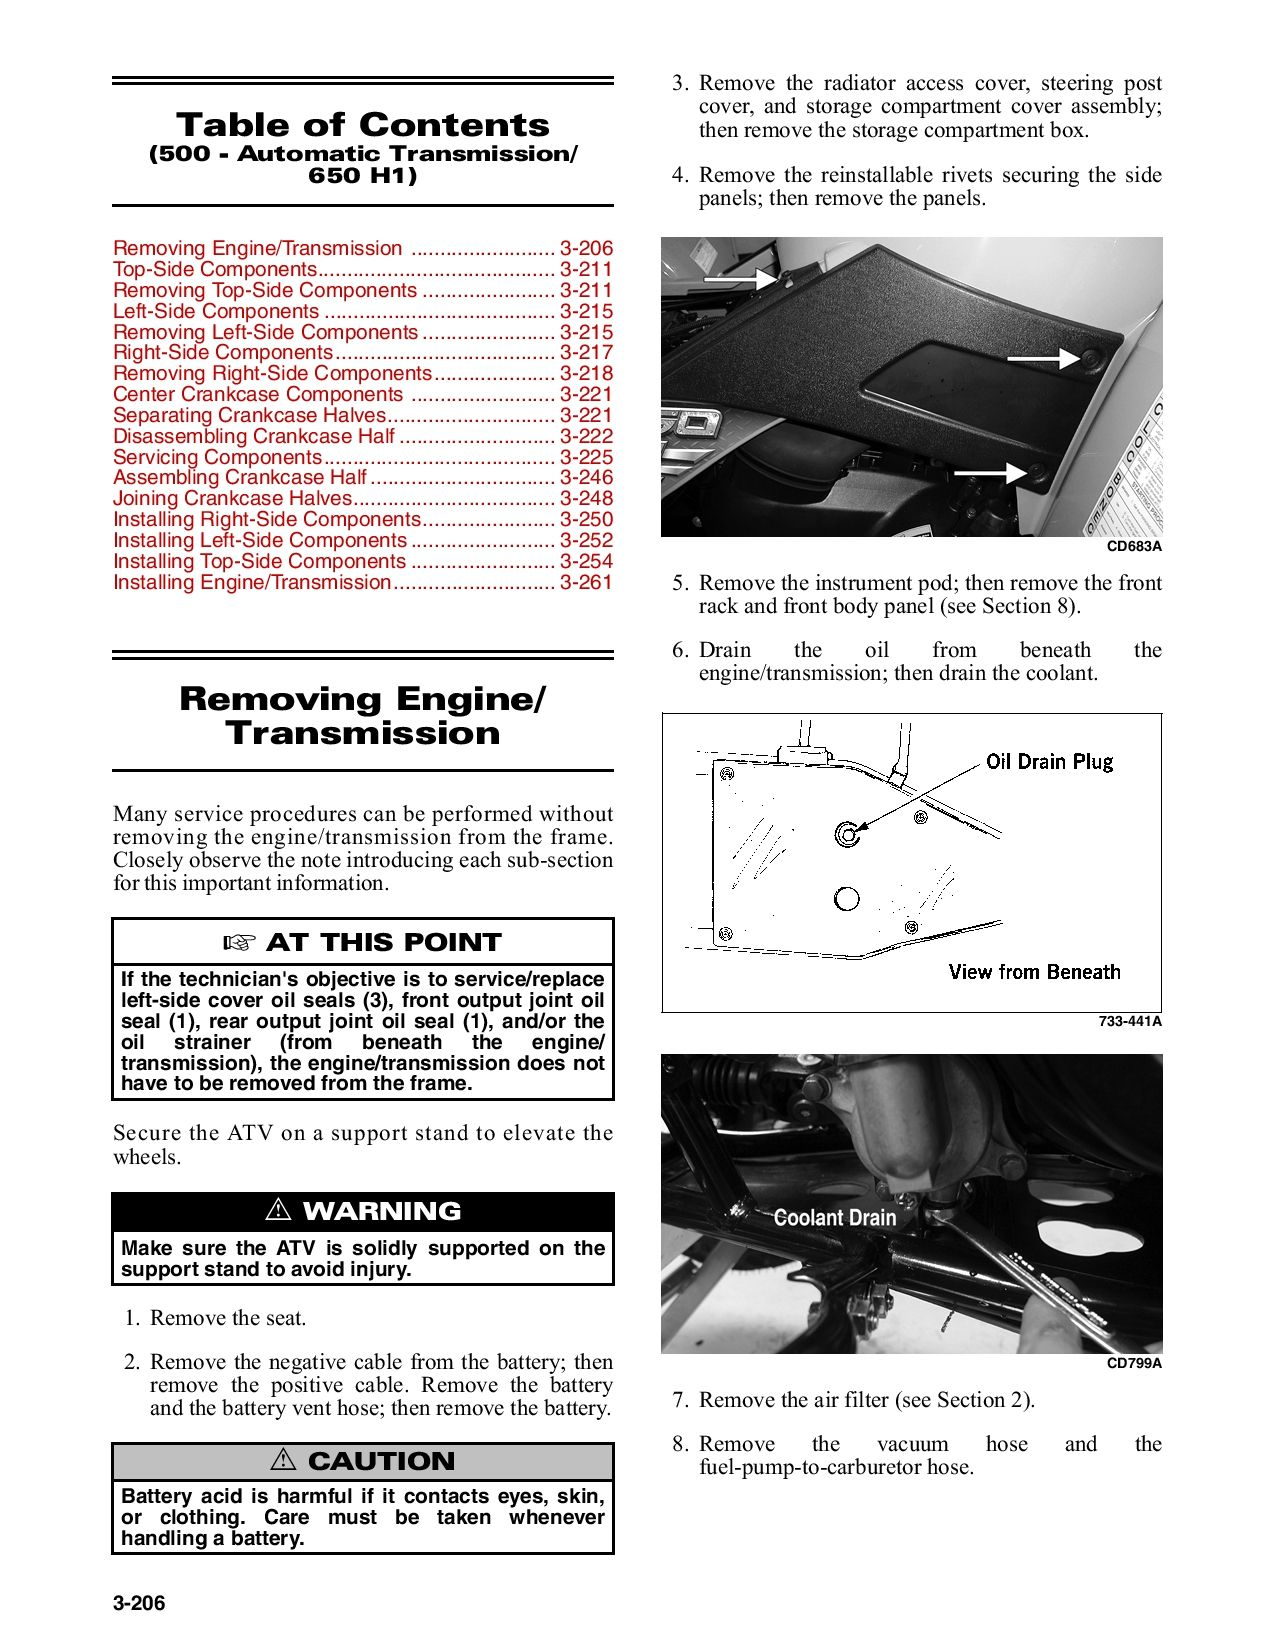 Arctic Cat 2005 Atv Service Manual 250 Up To 650 H1 Twin Part 2 Service Manual Pdf Download Repair Manuals Manual Pdf Download